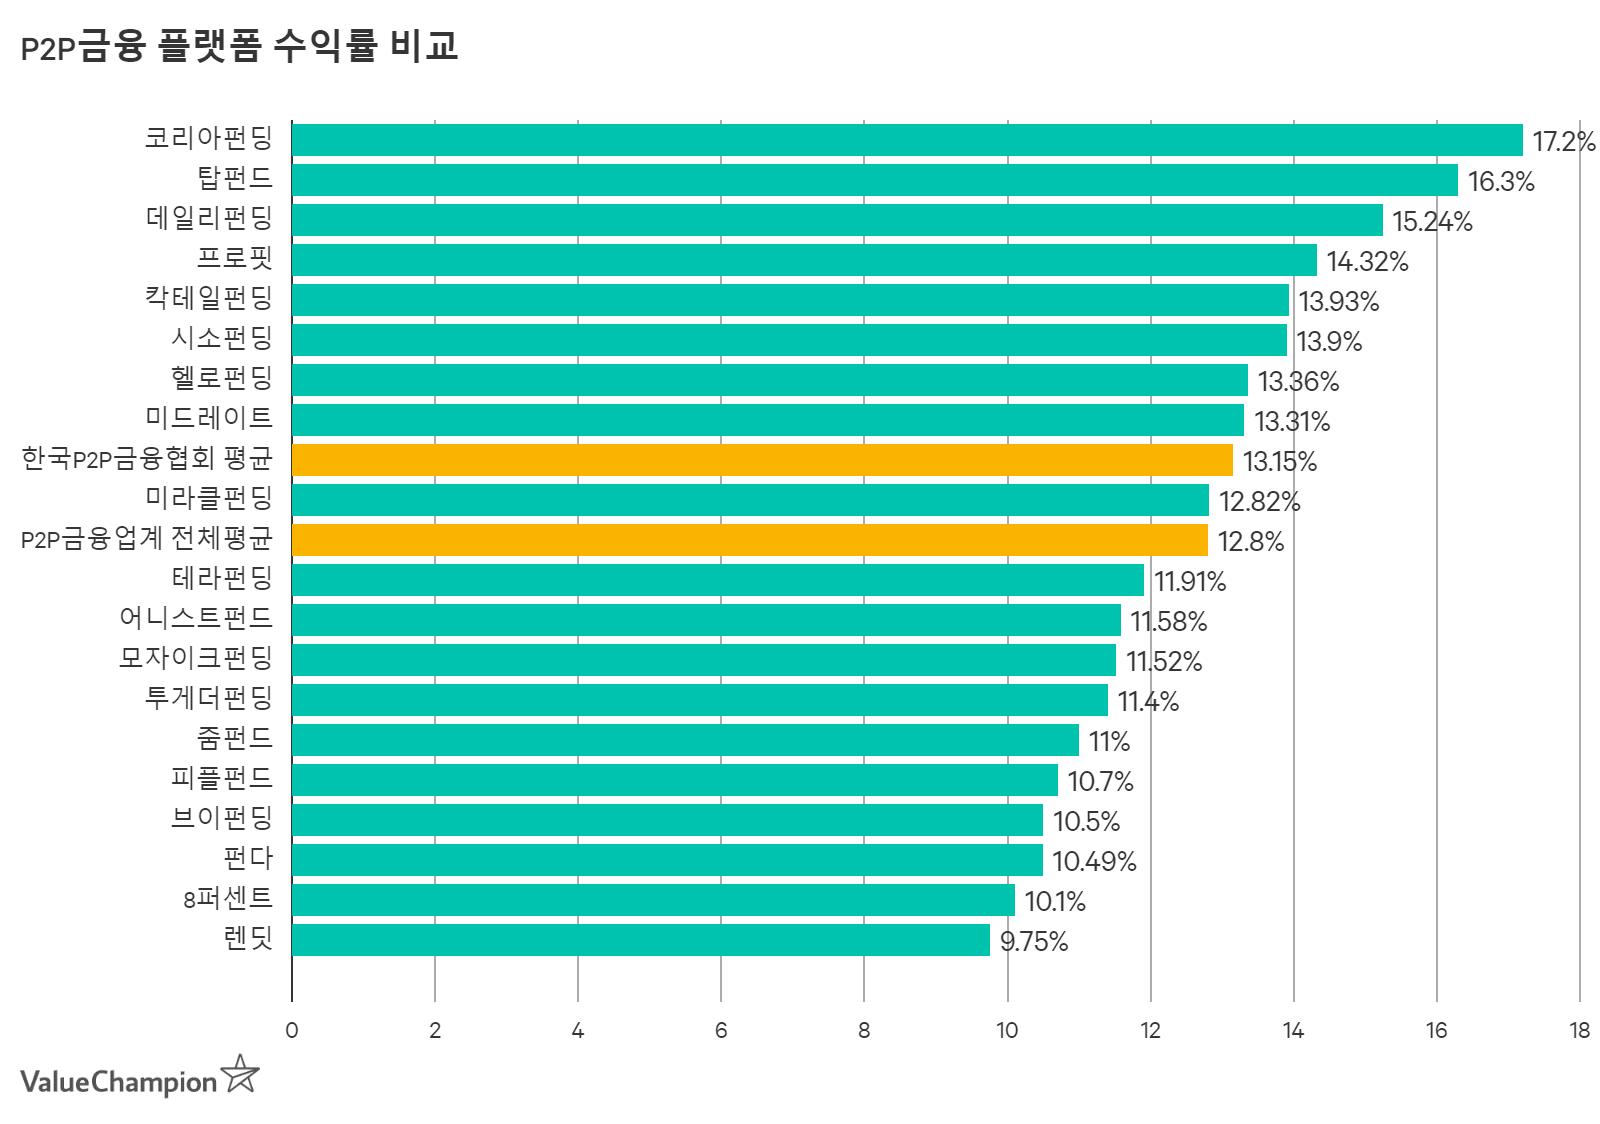 P2P플랫폼 별 평균 수익률 비교